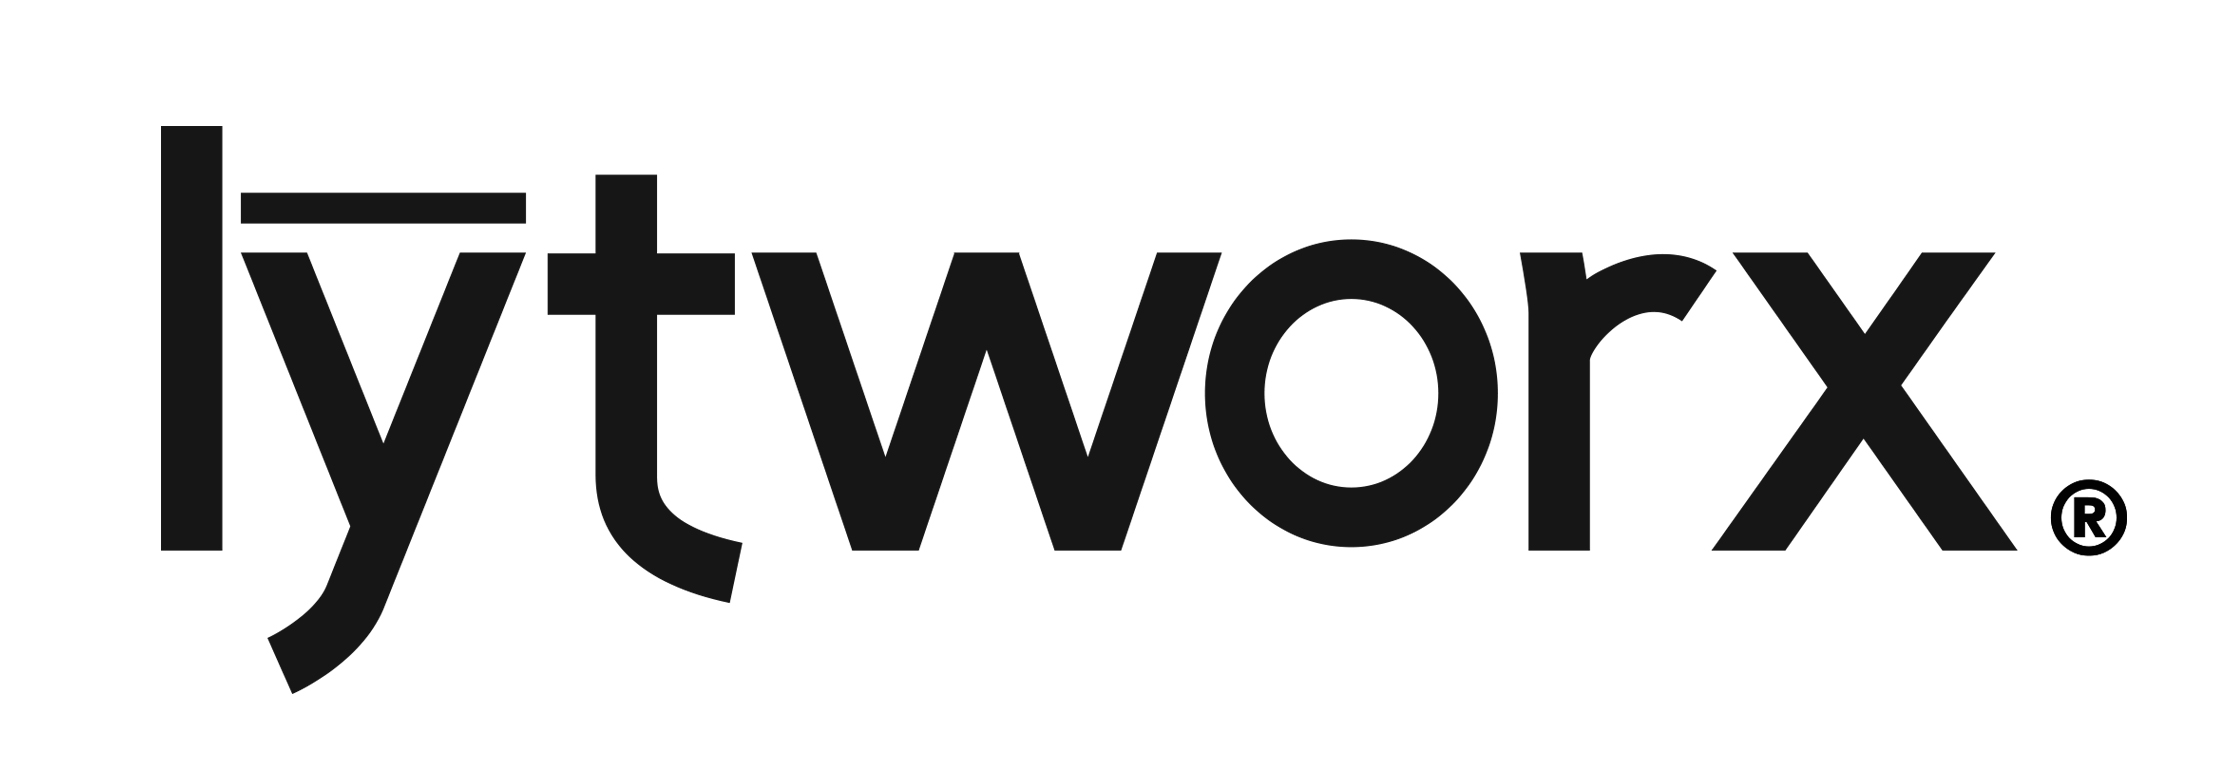 Logo - Lytworx